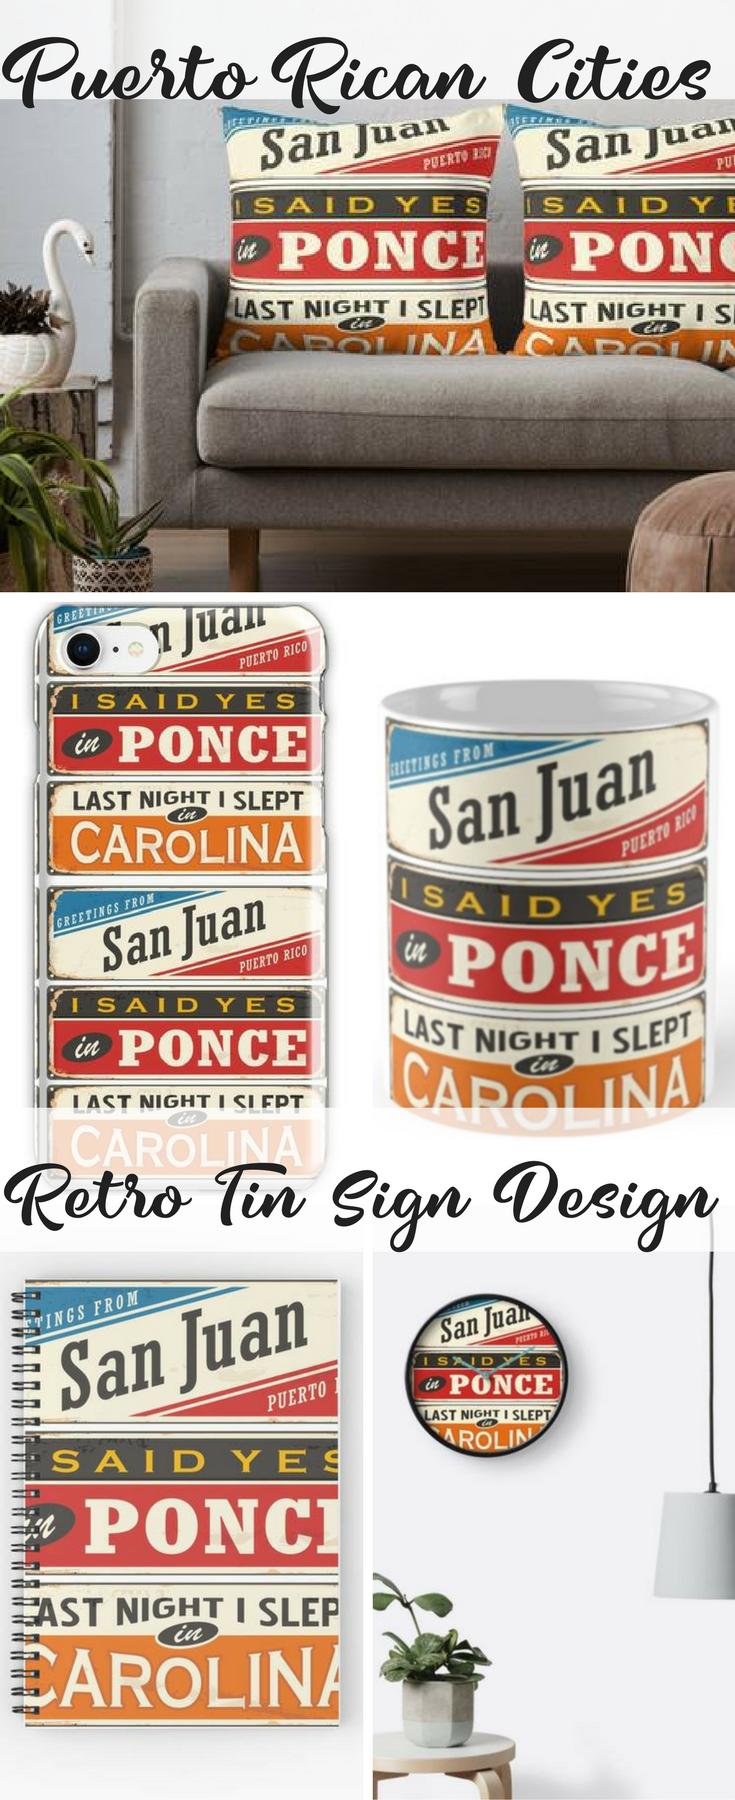 This Cute Retro Design Starts In San Juan Puerto Rico Is An Island